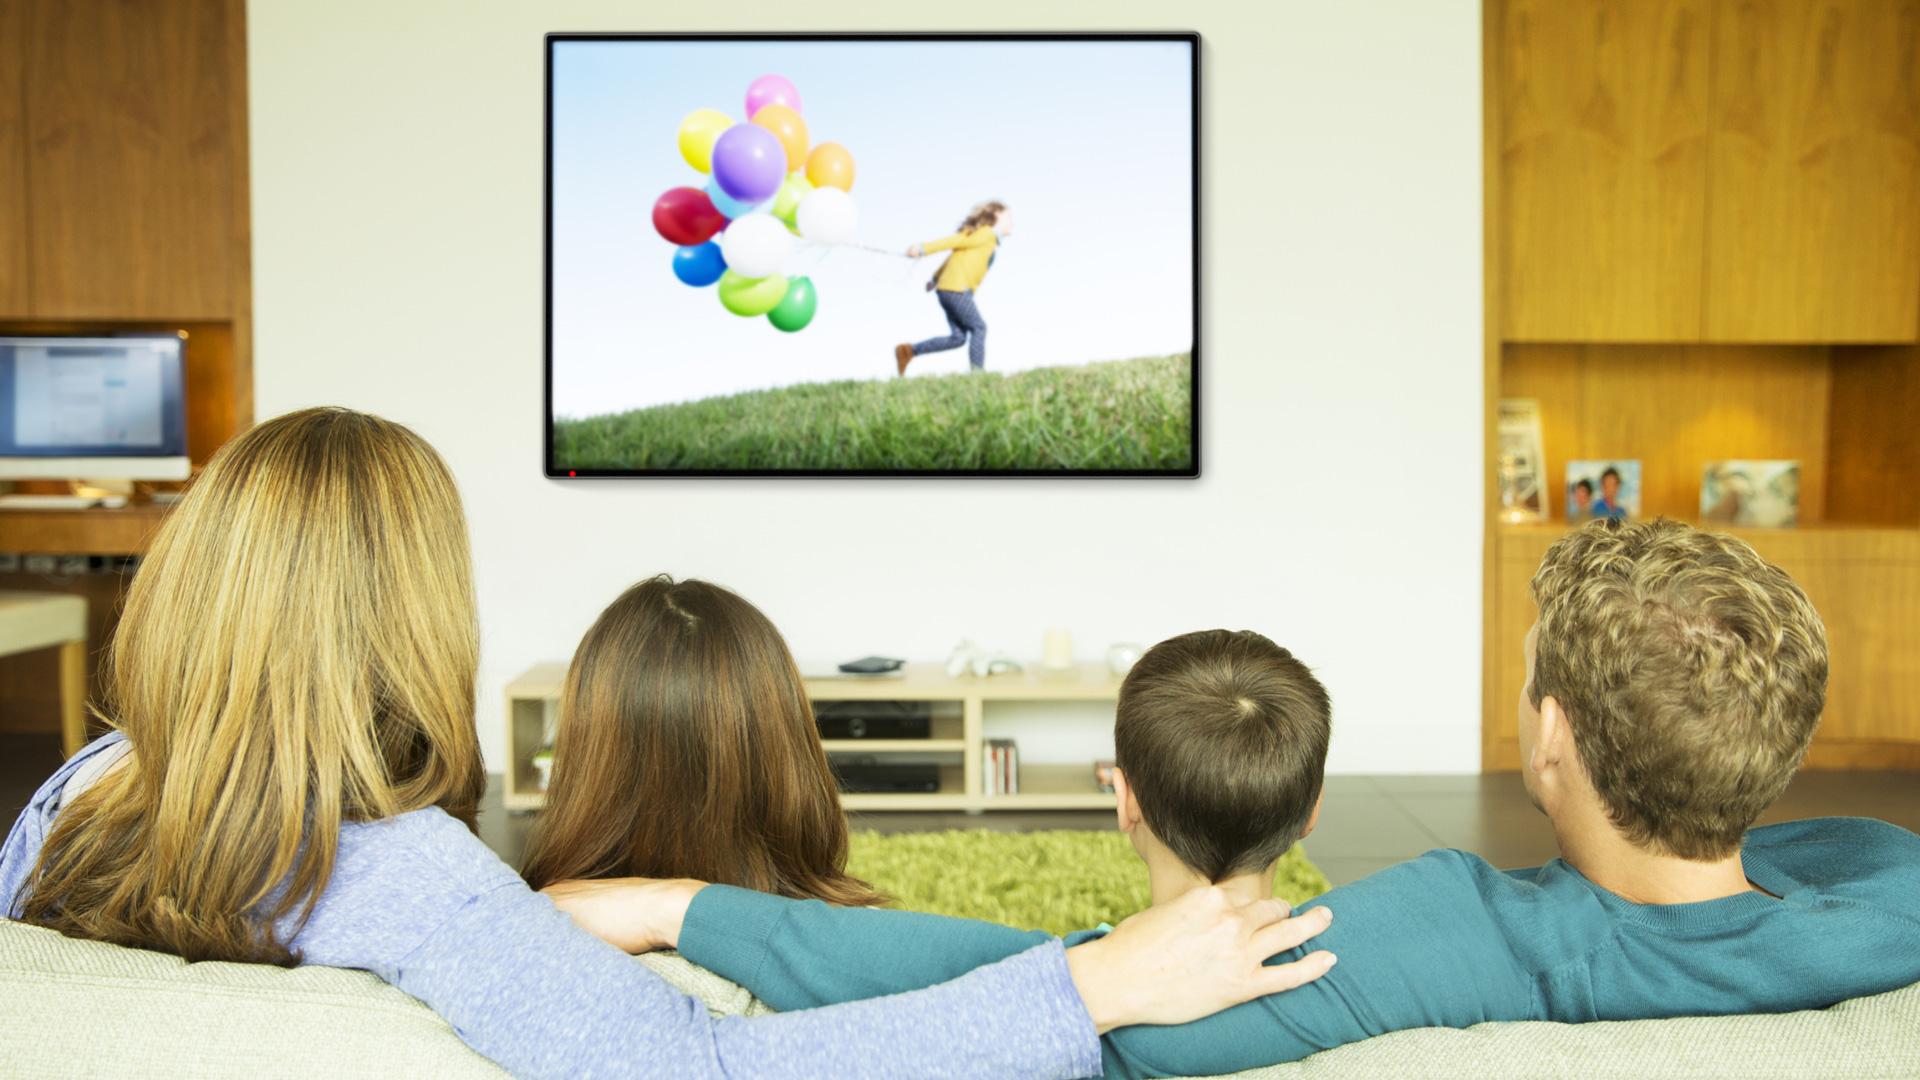 watching-tv-feature1.jpeg